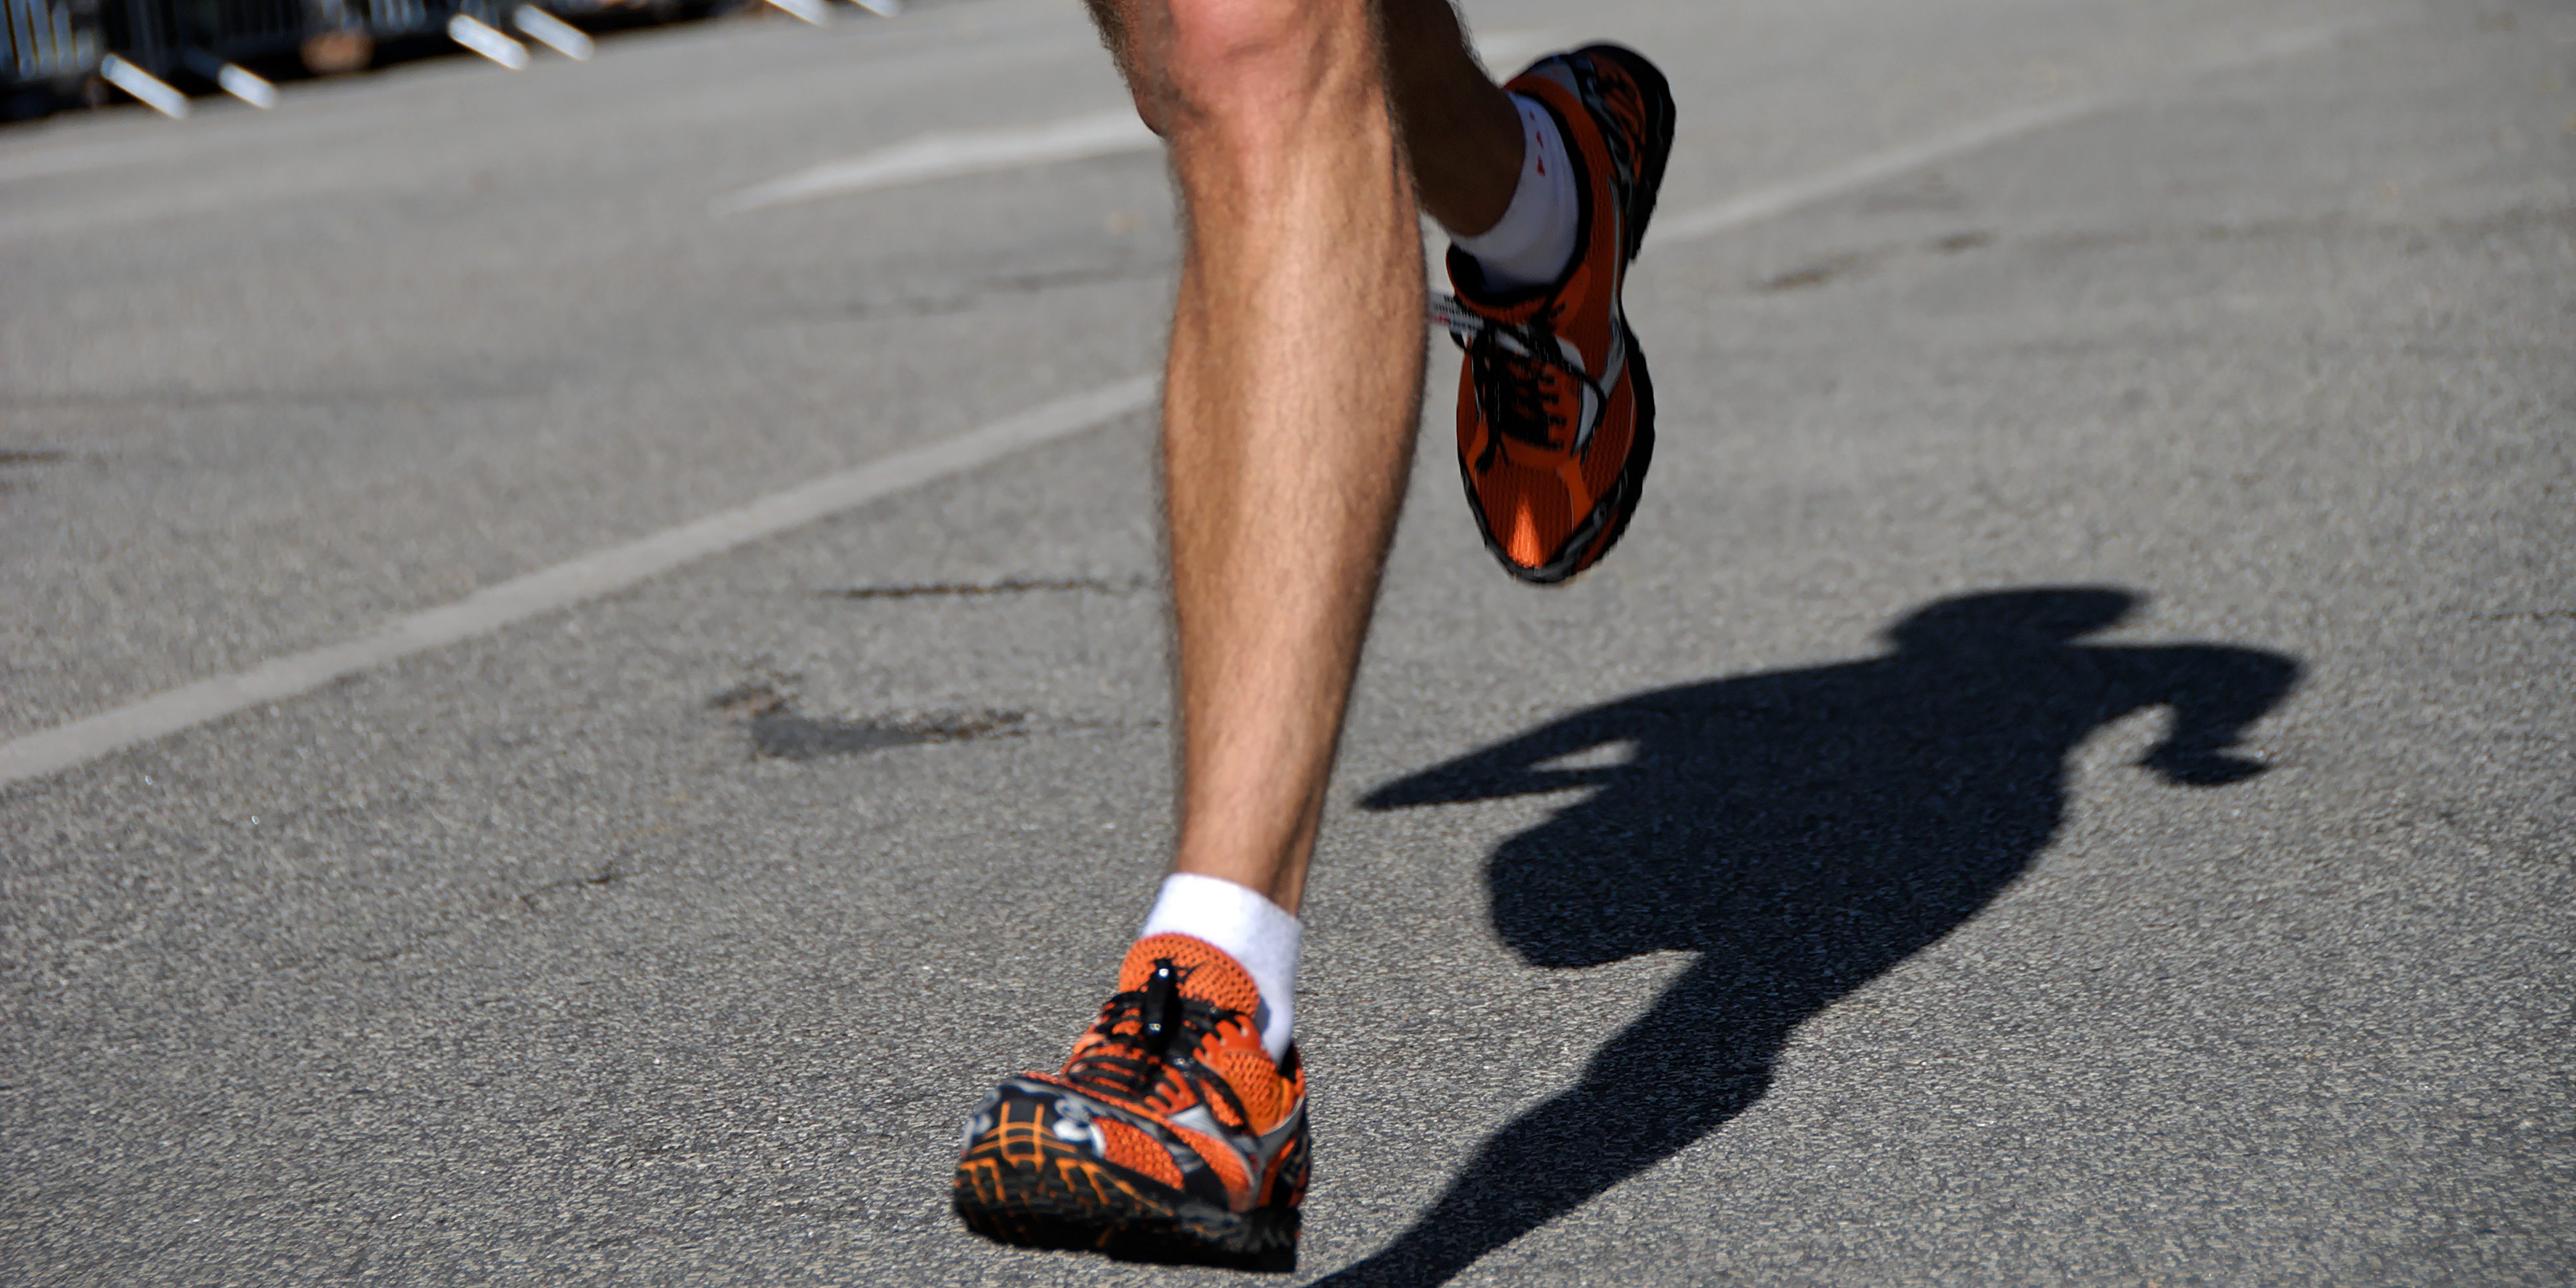 Läufer Bild Petra Bork / pixelio